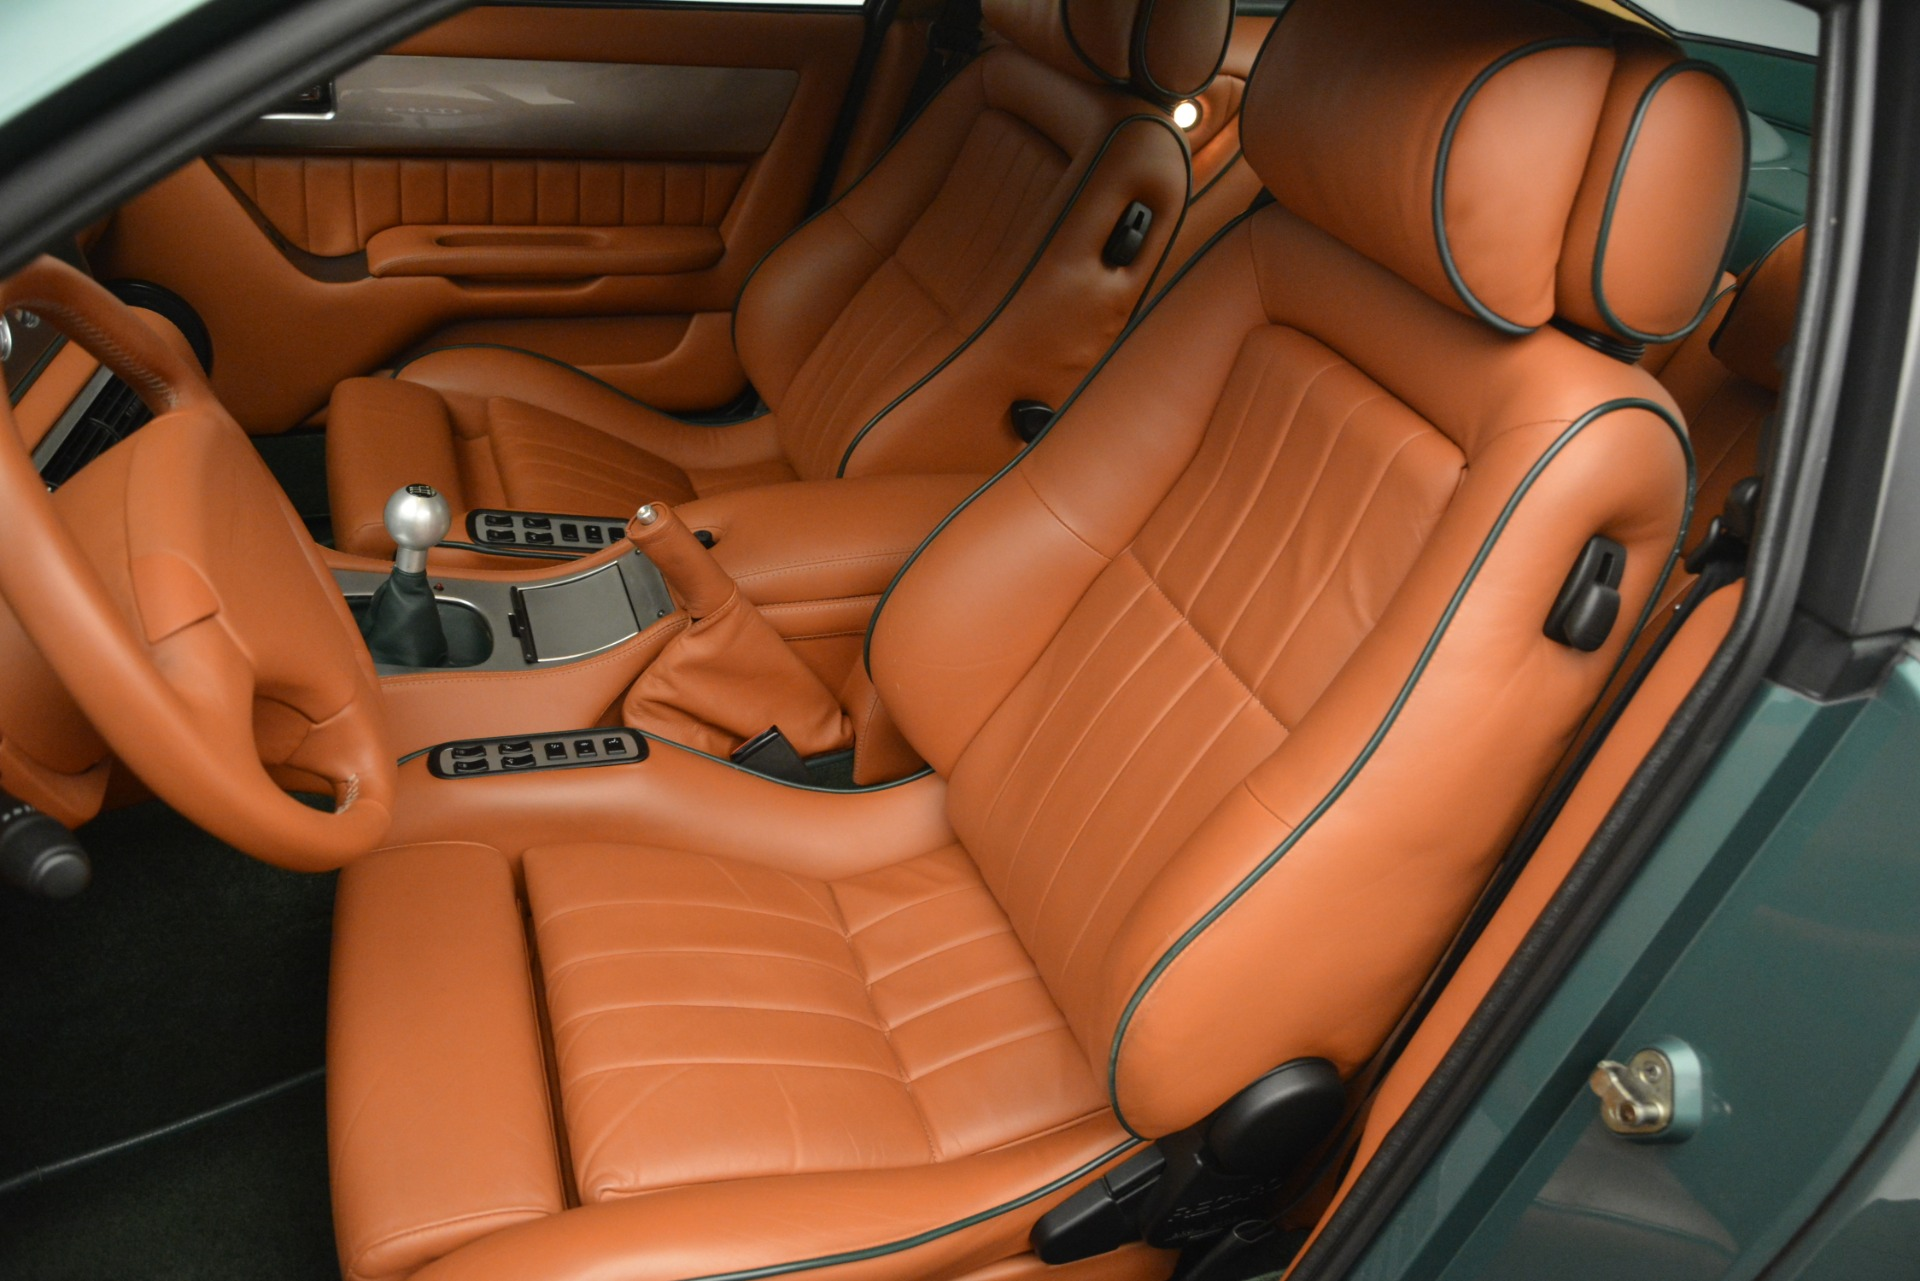 Used 1999 Aston Martin V8 Vantage Le Mans V600 Coupe For Sale In Westport, CT 2789_p17